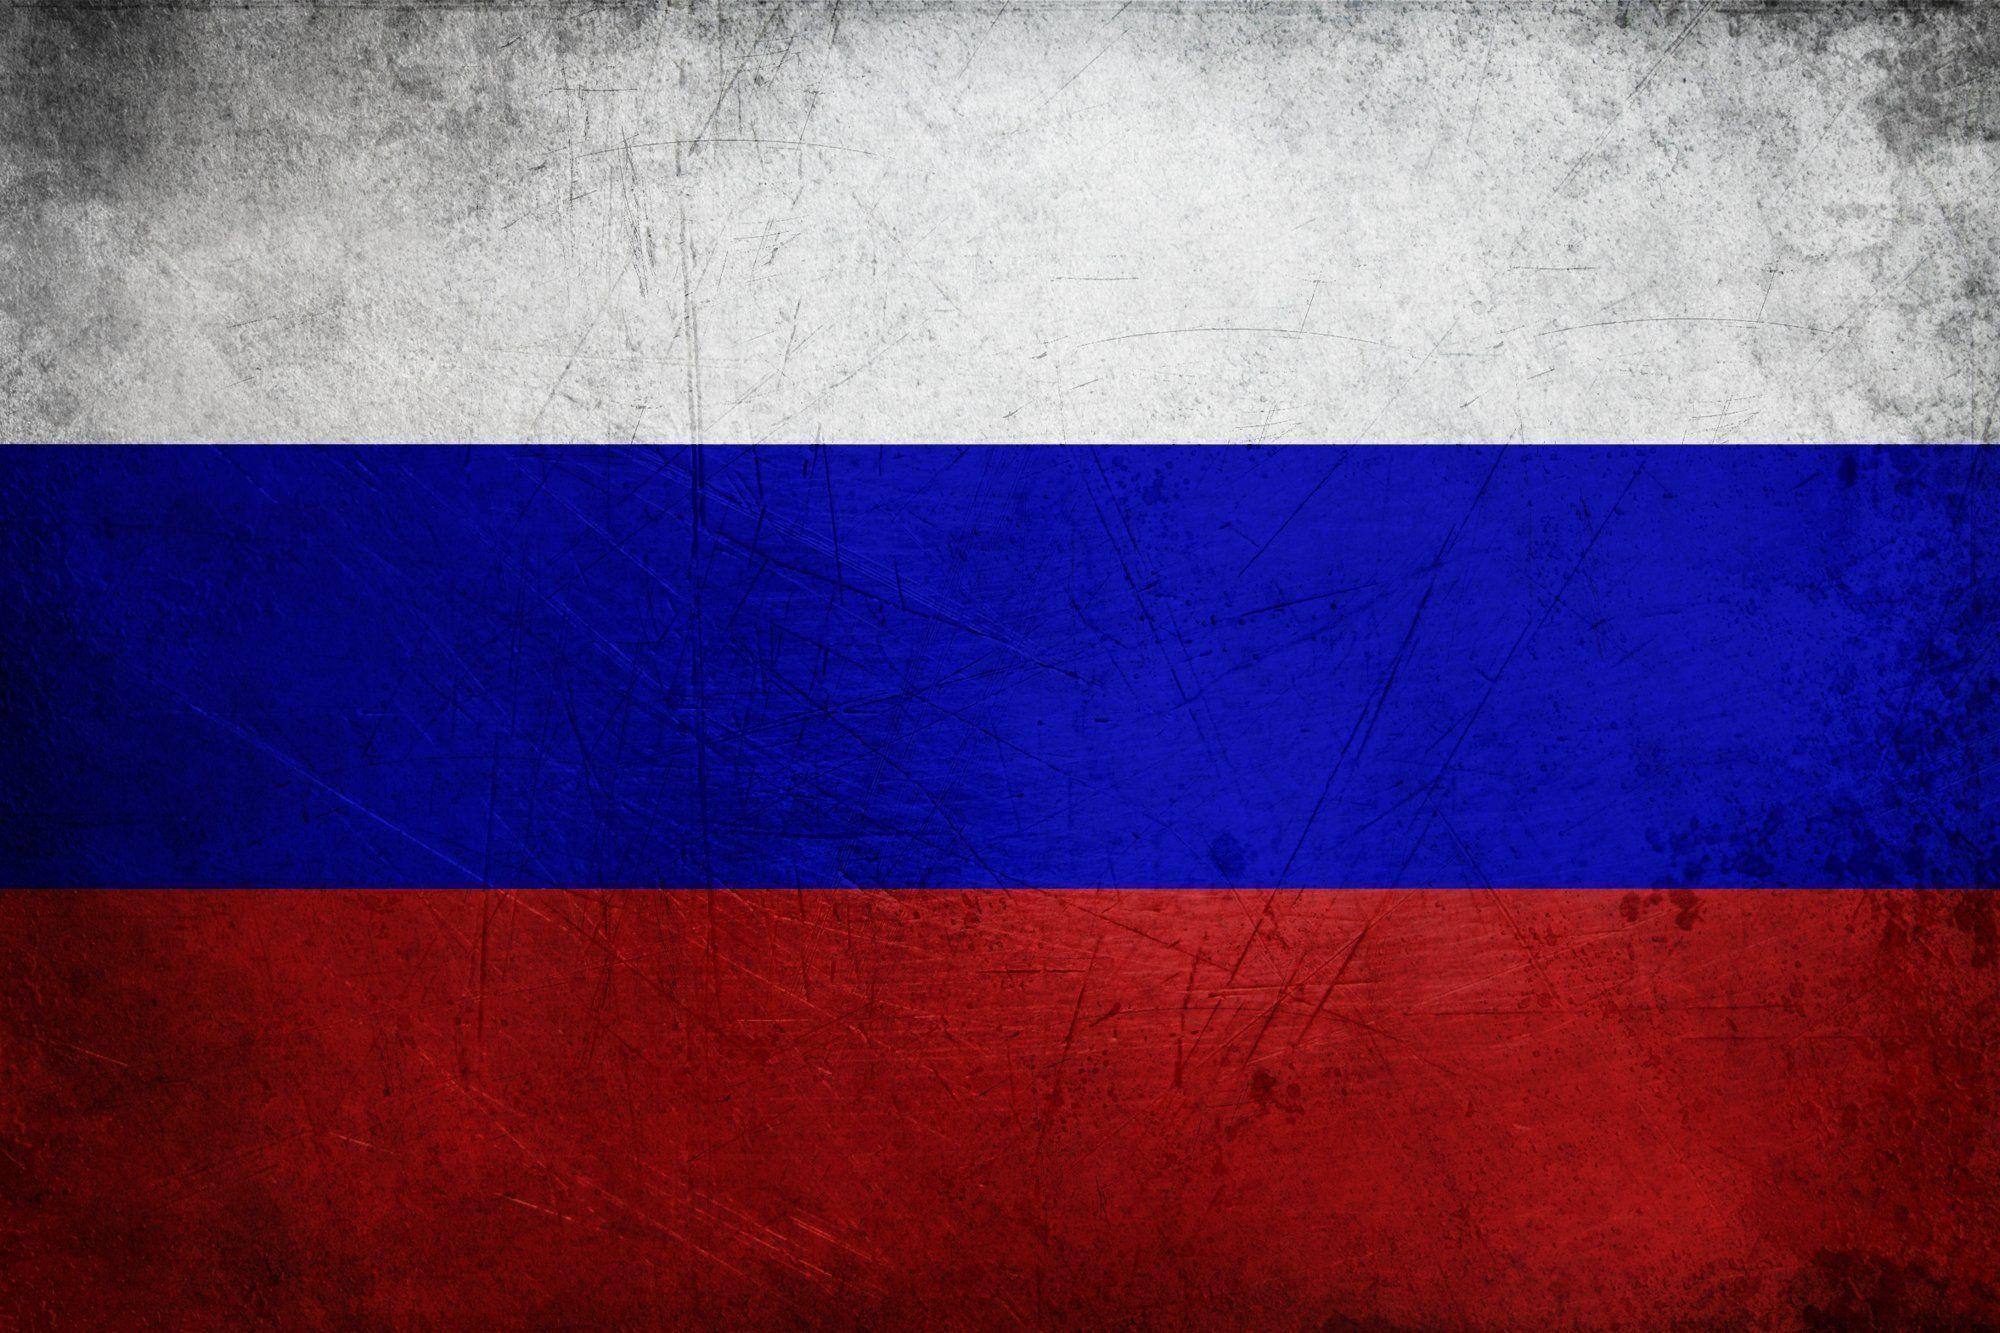 2000x1333 RUSSIAN FLAG russia flags wallpaper   2000x1333   508580   WallpaperUP